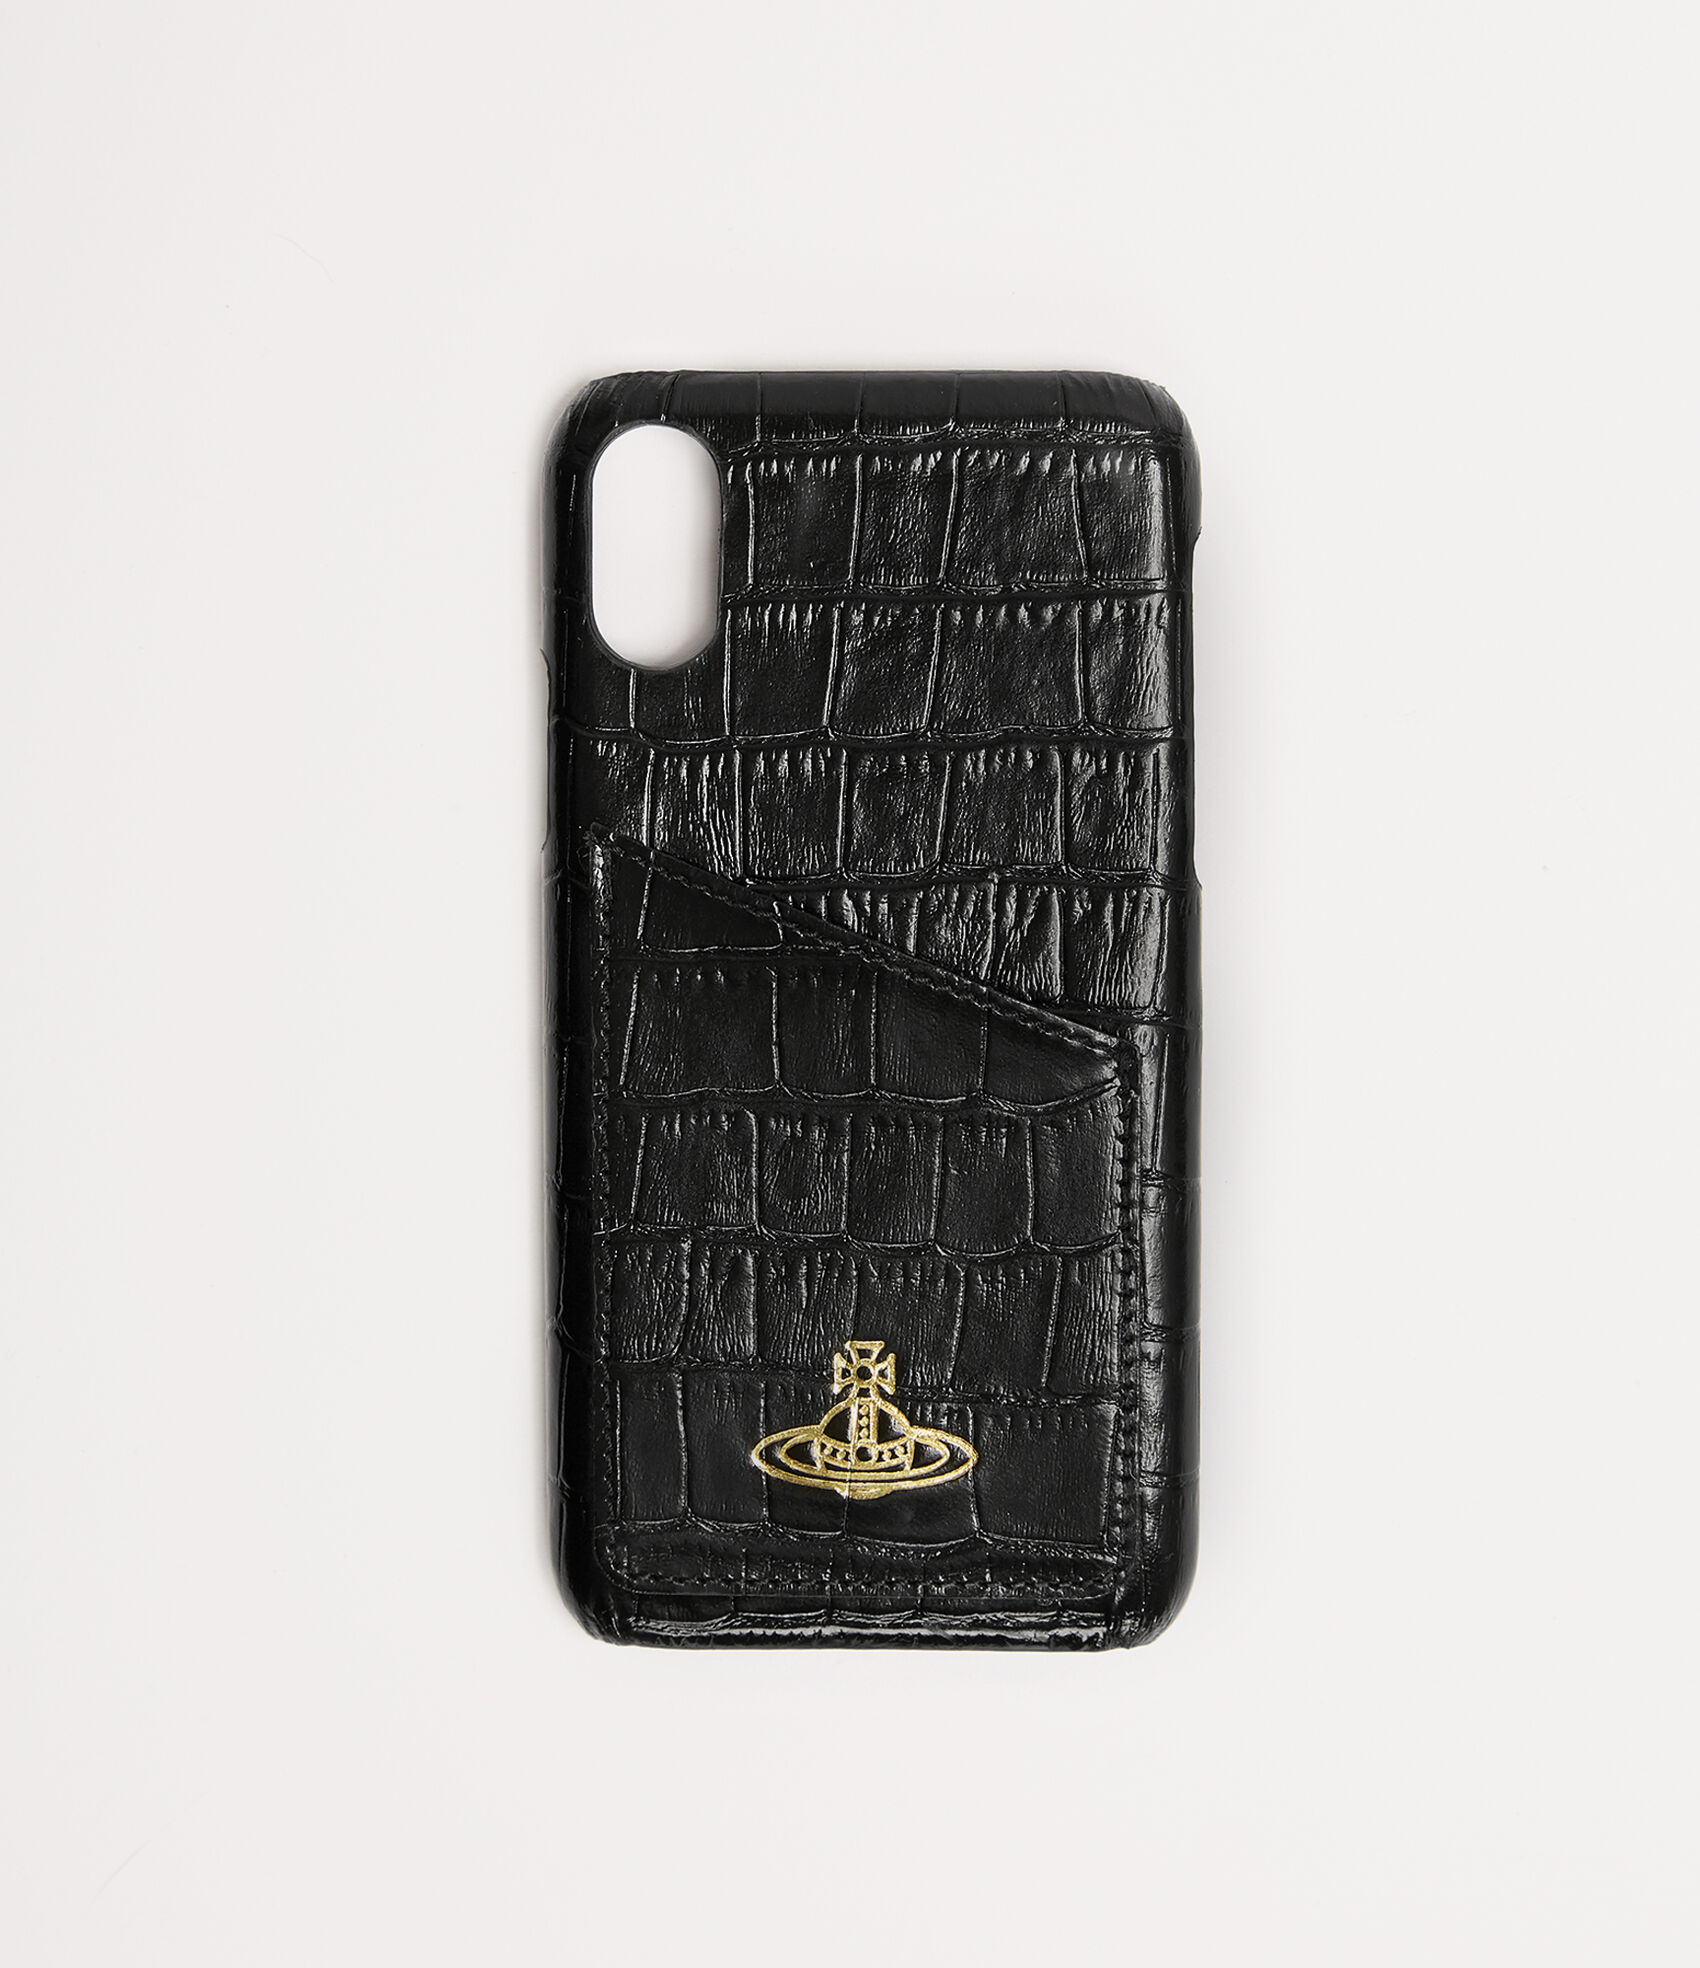 Iphone X Case With Card Black 3c1cb1f5d1